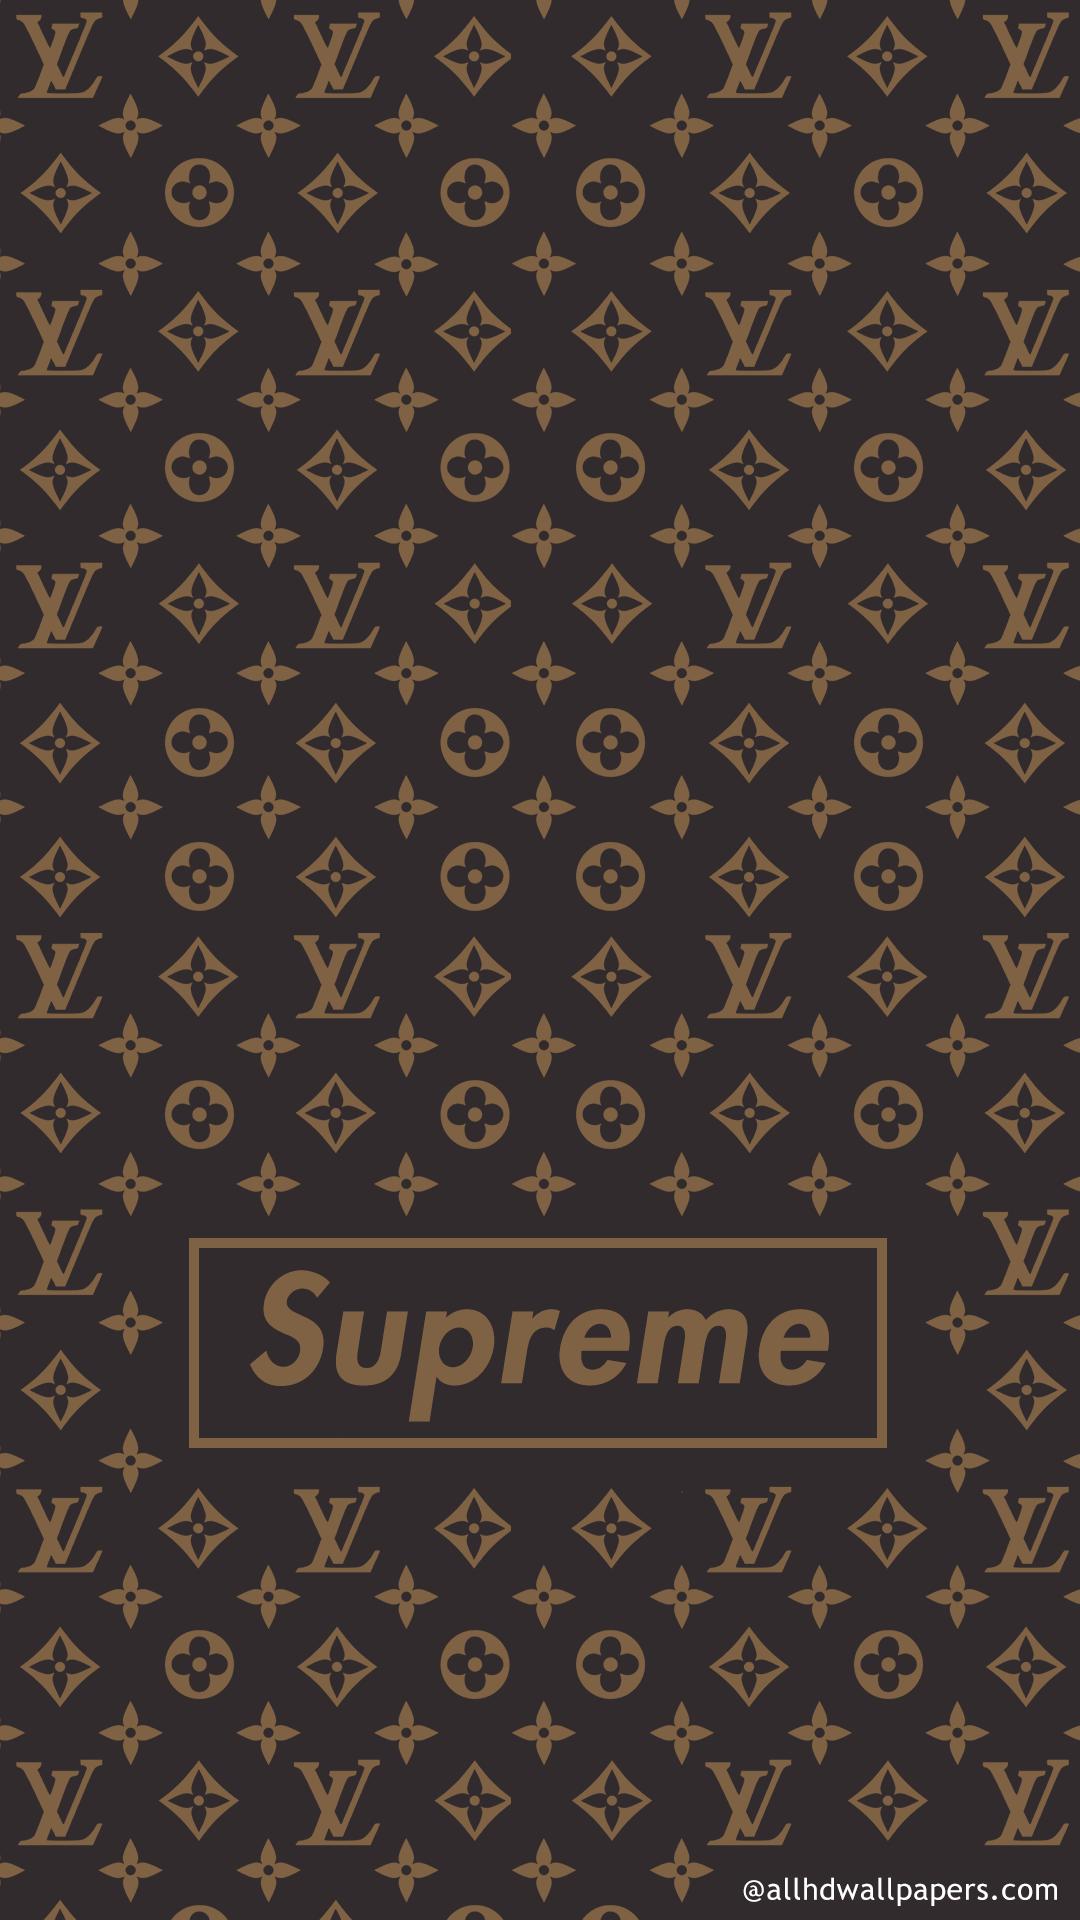 70 Supreme Wallpapers In 4k Allhdwallpapers In 2020 Supreme Wallpaper Supreme Iphone Wallpaper Supreme Wallpaper Hd